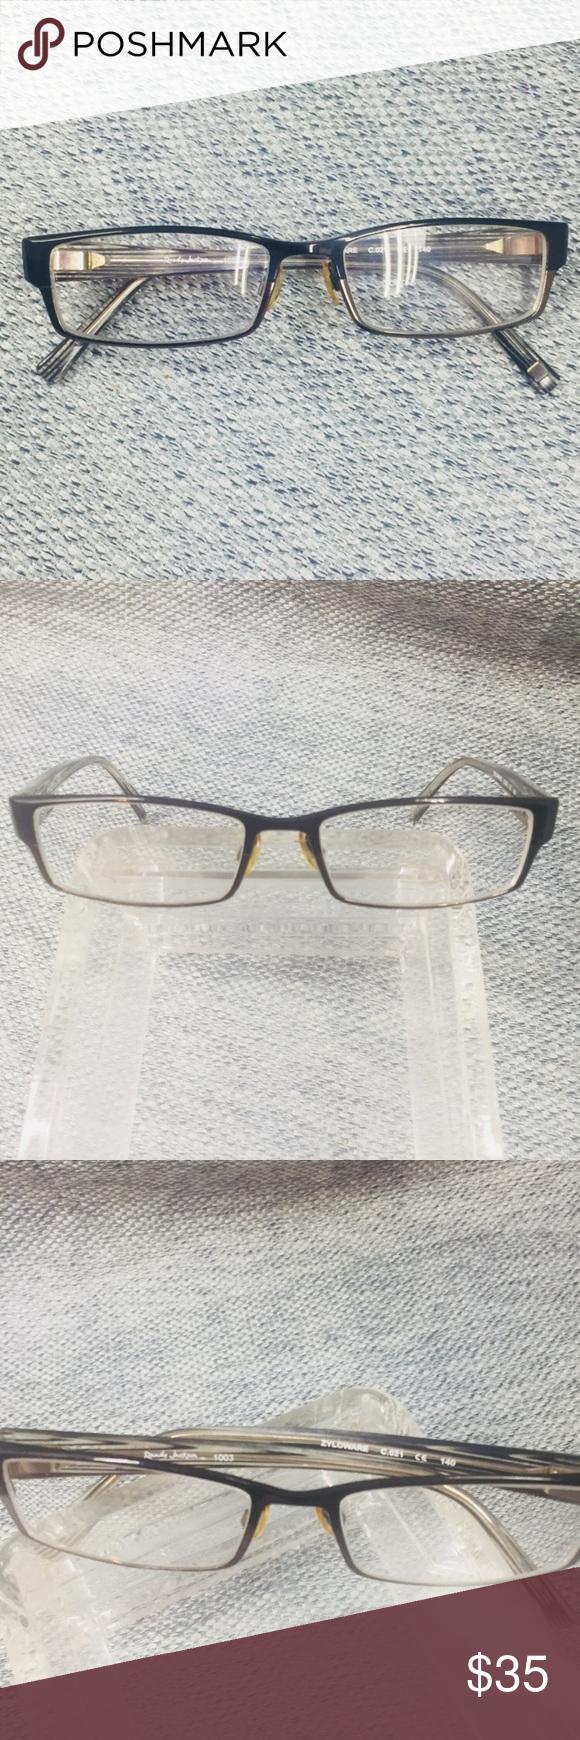 Randy Jackson eye glasses RX-able RJ 1003 Black